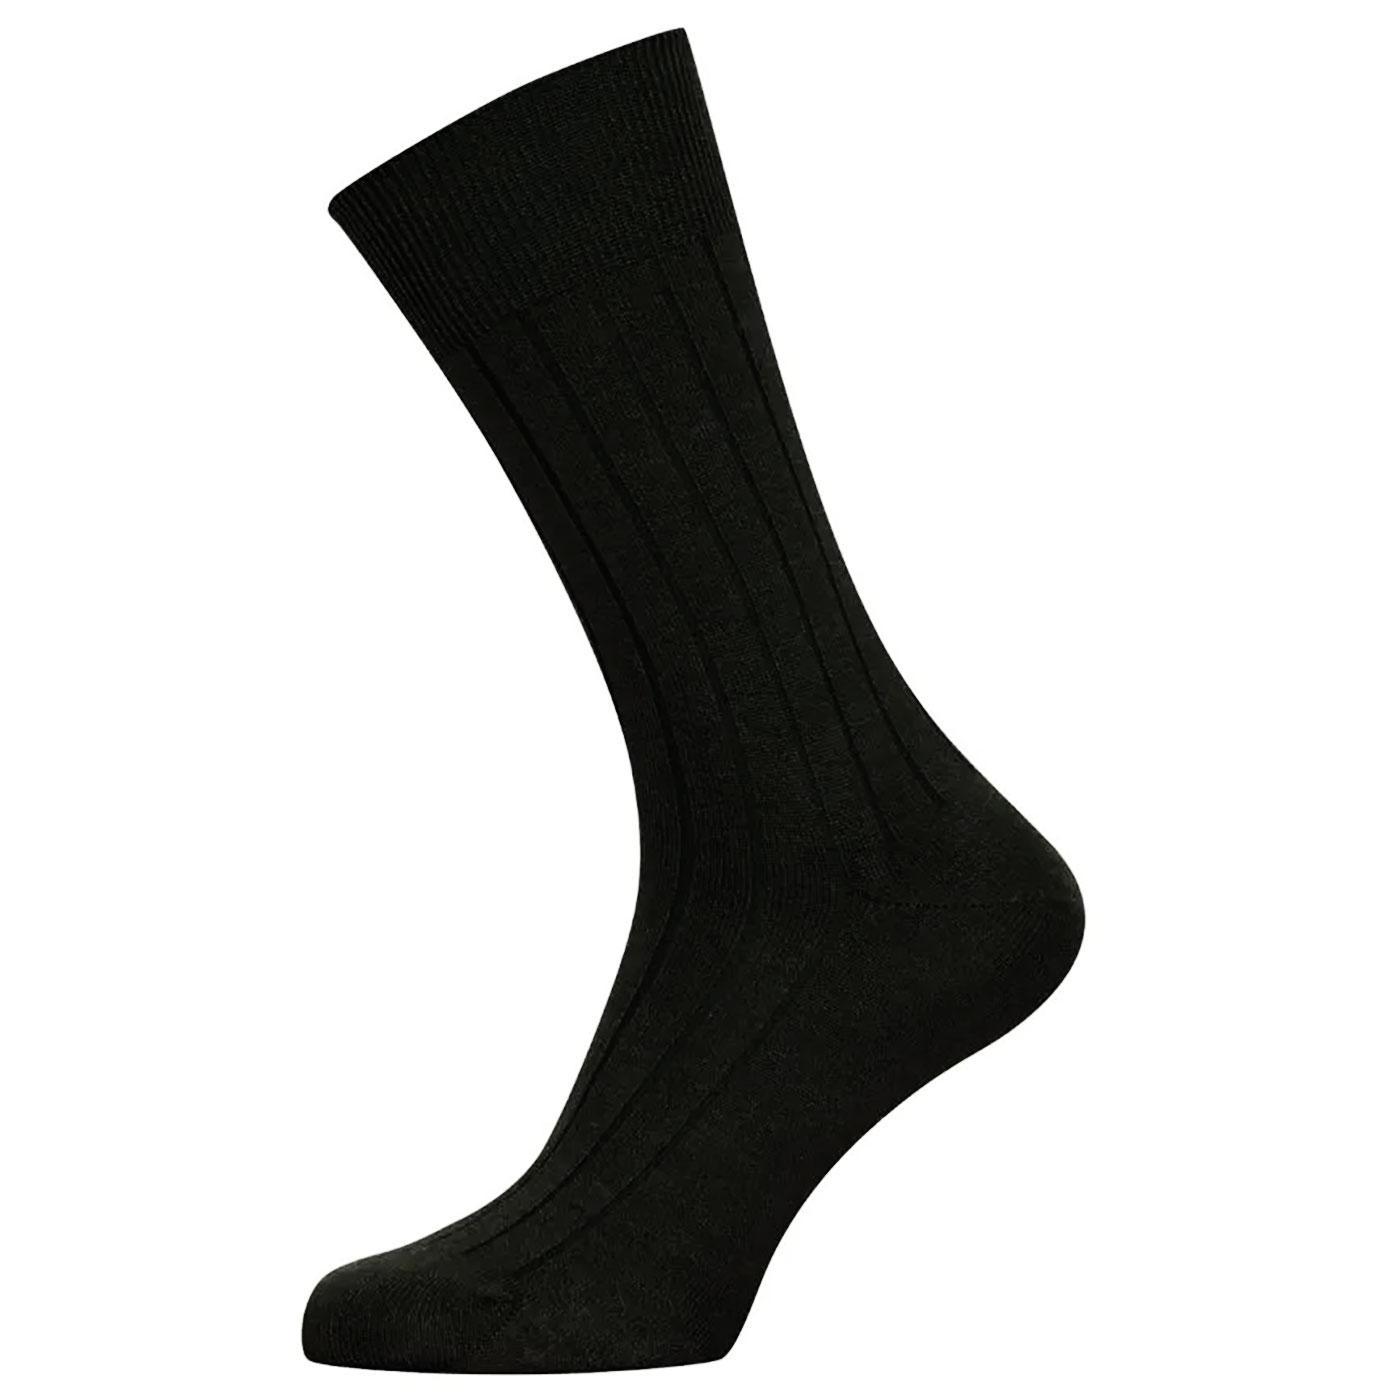 + Cira JOHN SMEDLEY Cotton & Wool Blend Socks B